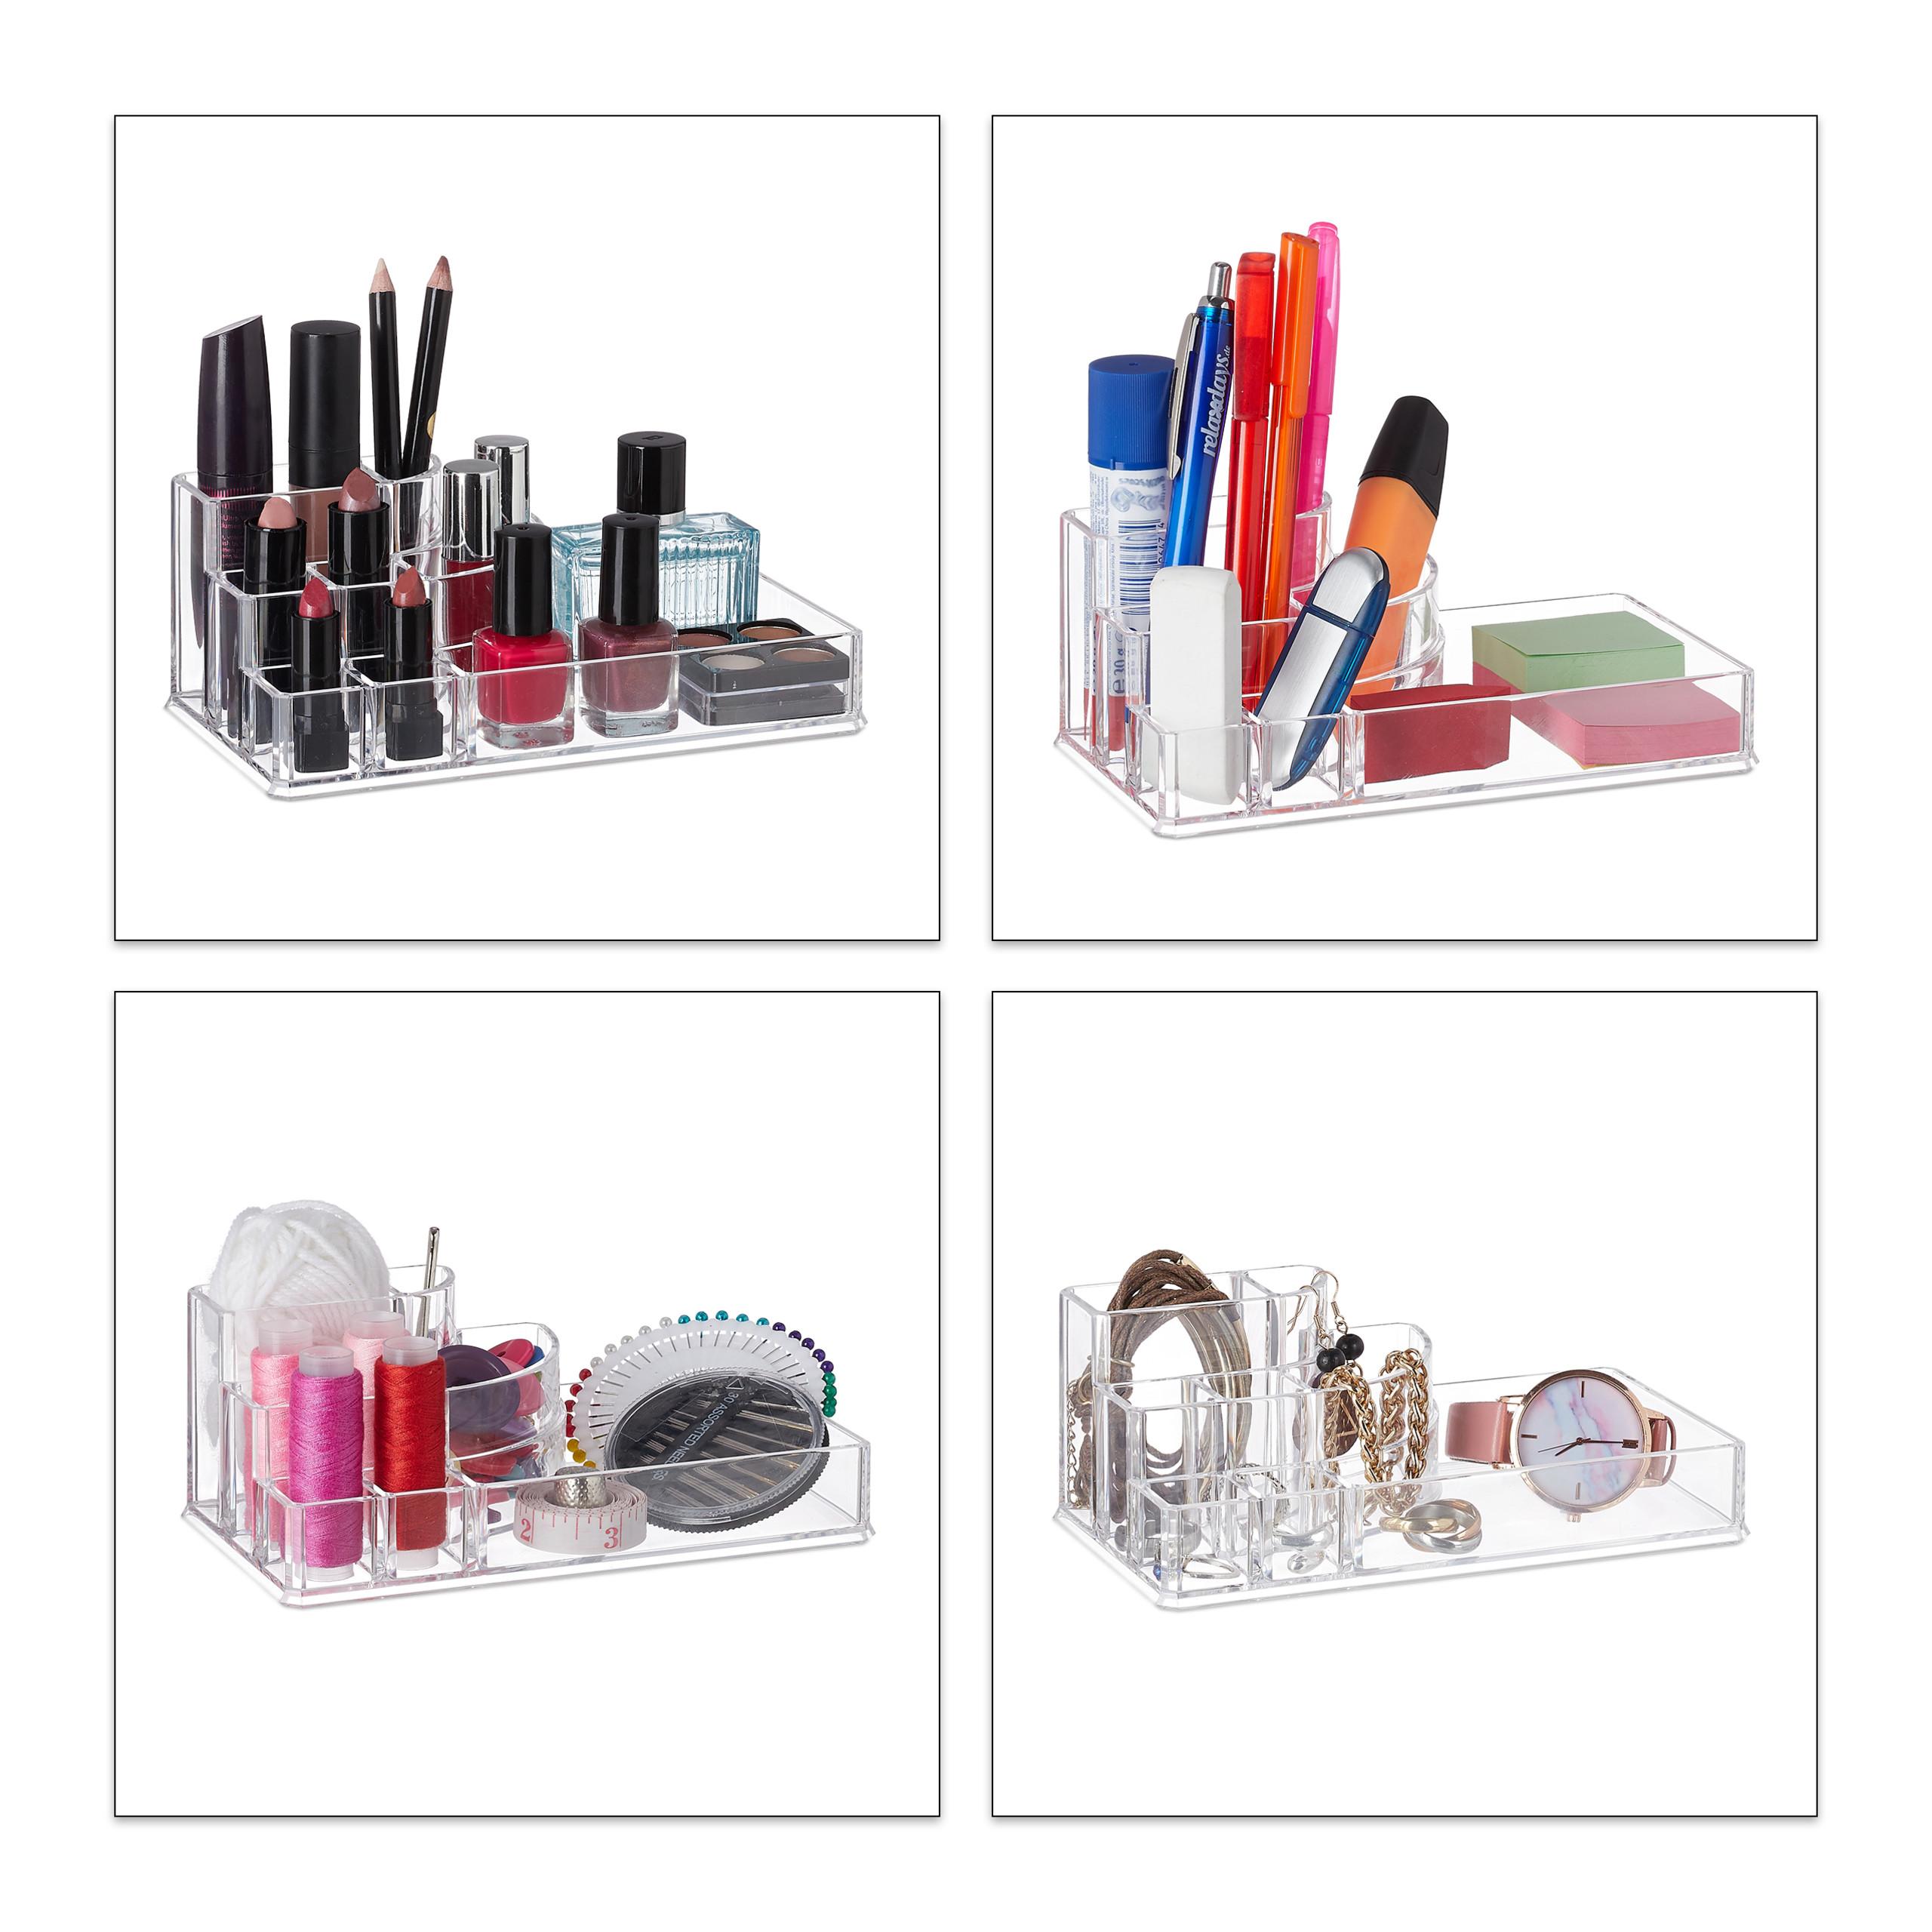 make-up-organizer-acryl-8-vakken-lippenstifthouder-opbergsysteem miniatuur 5